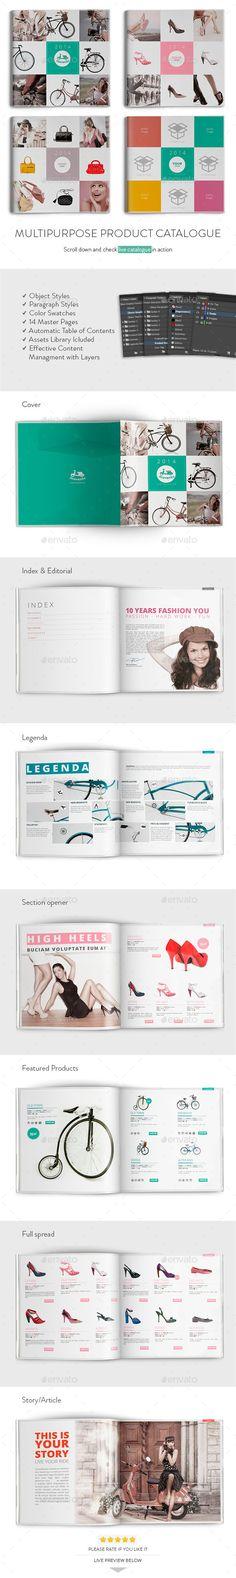 Multipurpose Product Catalogue - Catalogs Brochures